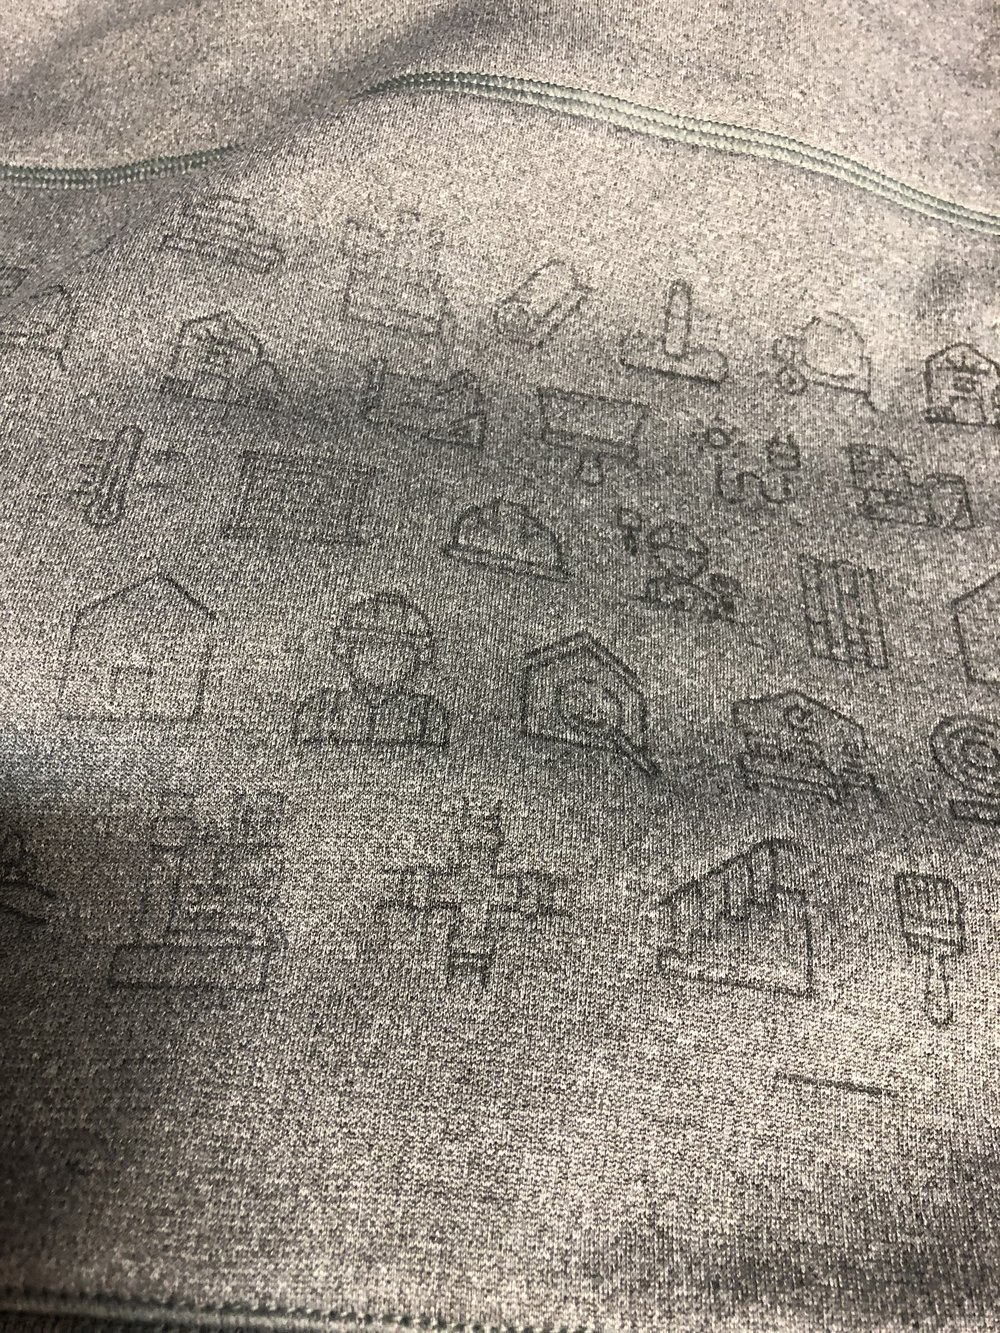 logounltd_laser_etching_embroidery_screen_printing_apparel_uniform_custom_tshirts_kirkland_bellevue_seattle_redmond_woodinville_branded_merchandise_promotional_products_logo_unltd_ tshirts_design_custom (16).jpg